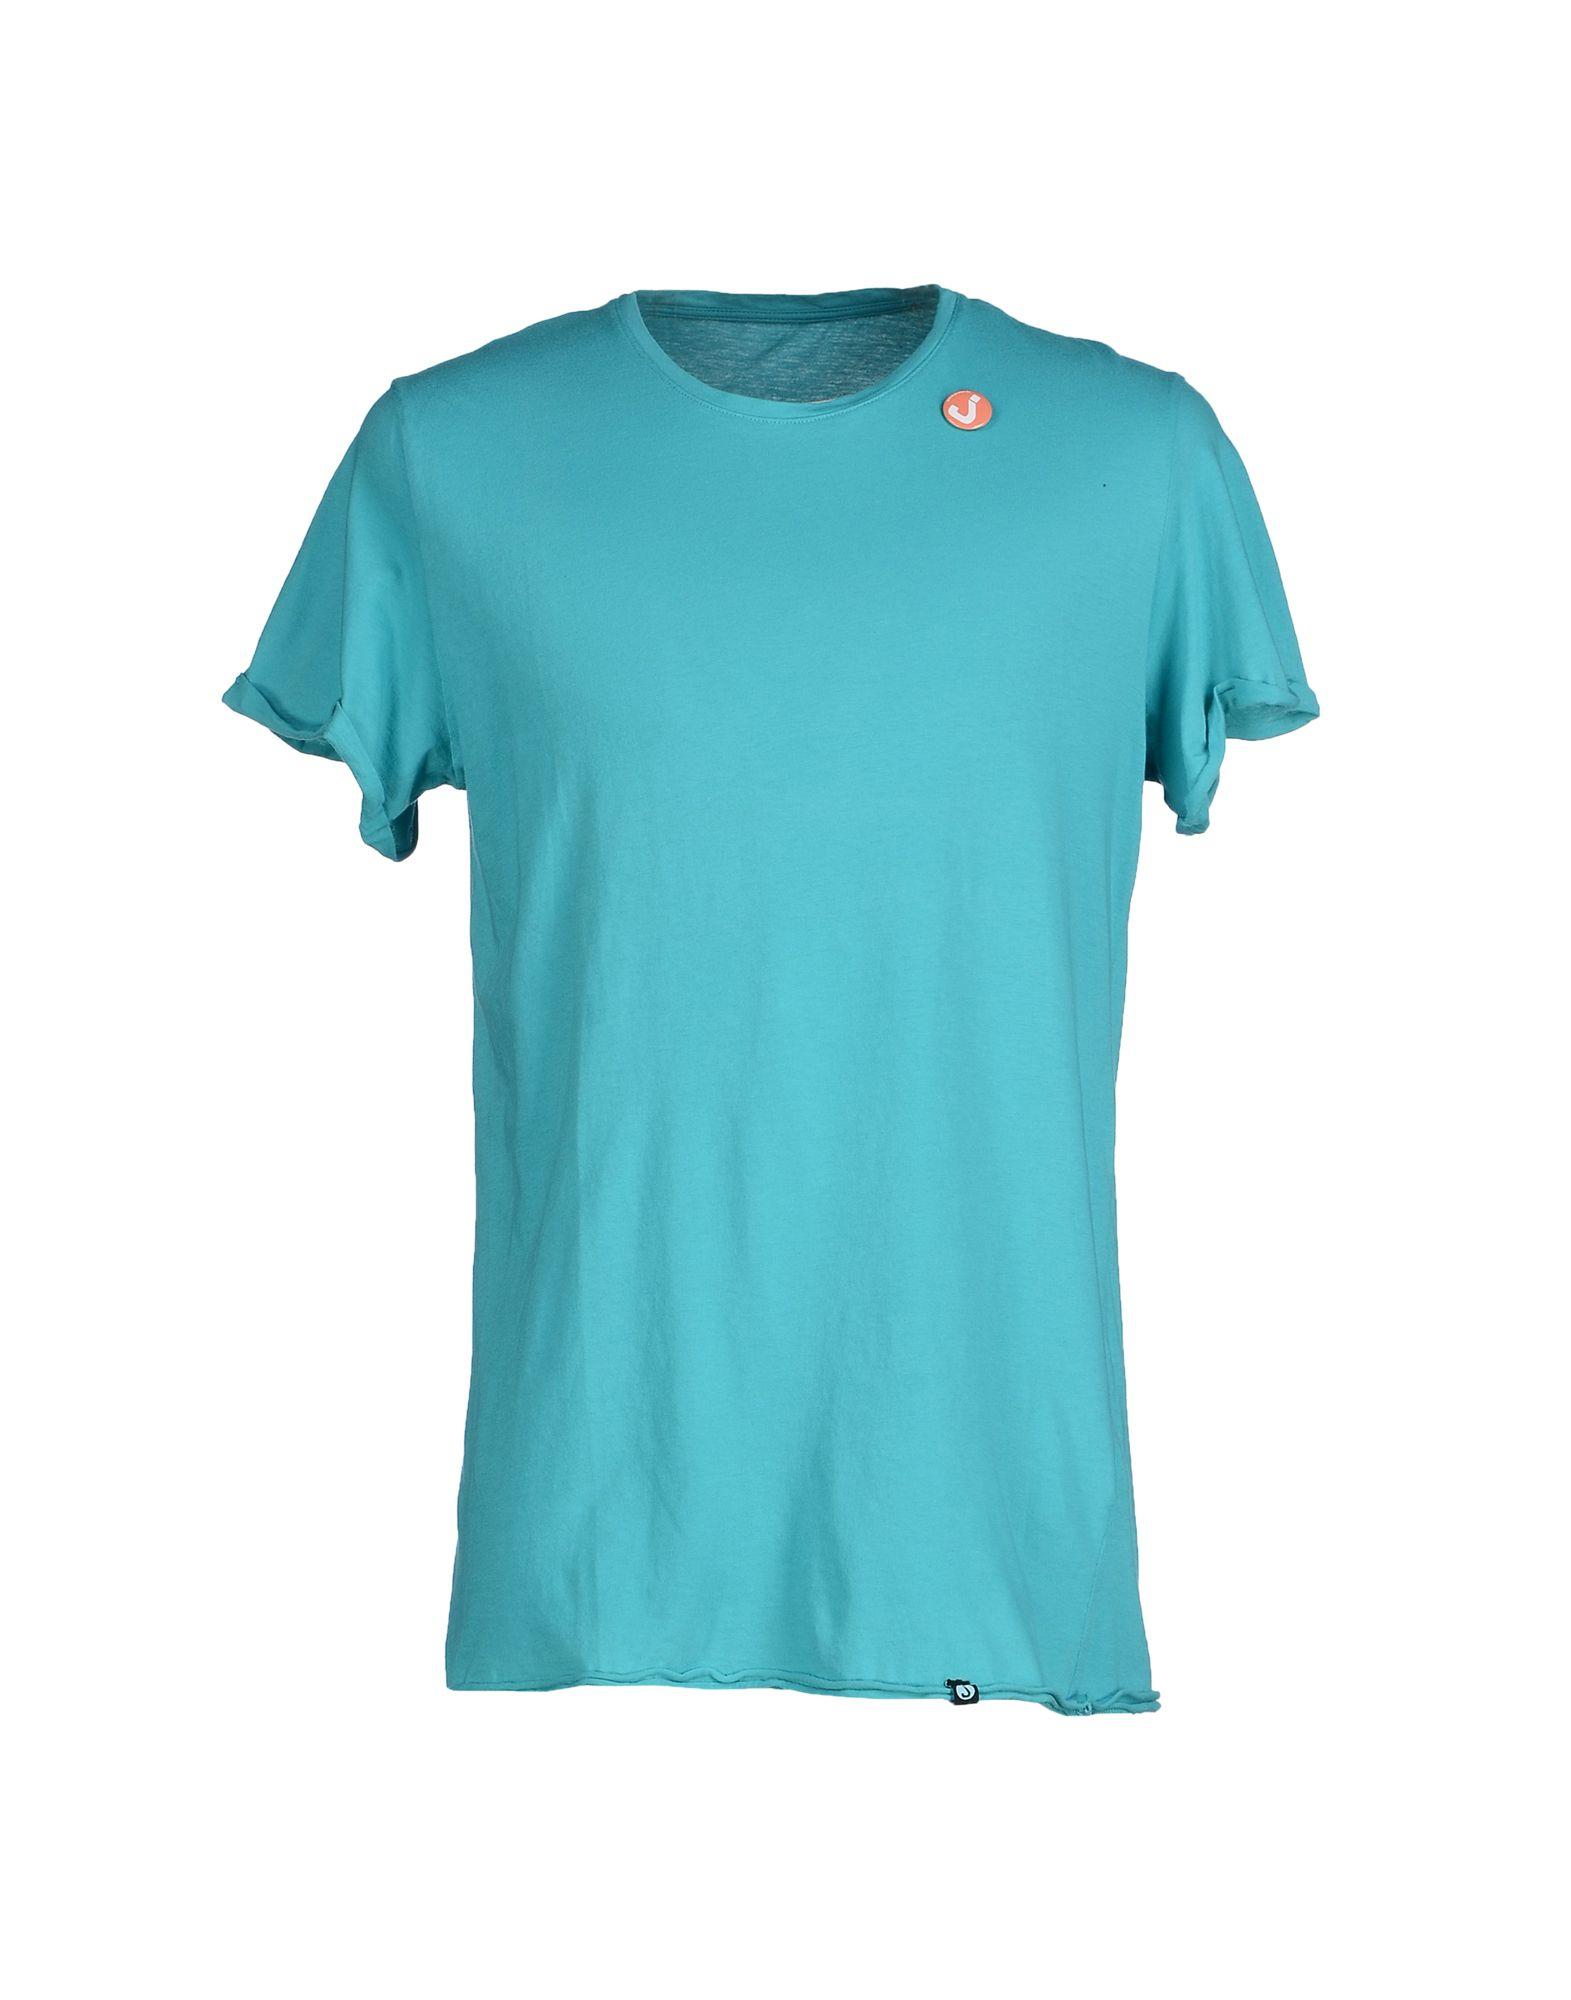 Jcolor t shirt in blue for men turquoise lyst for Aqua blue color t shirt